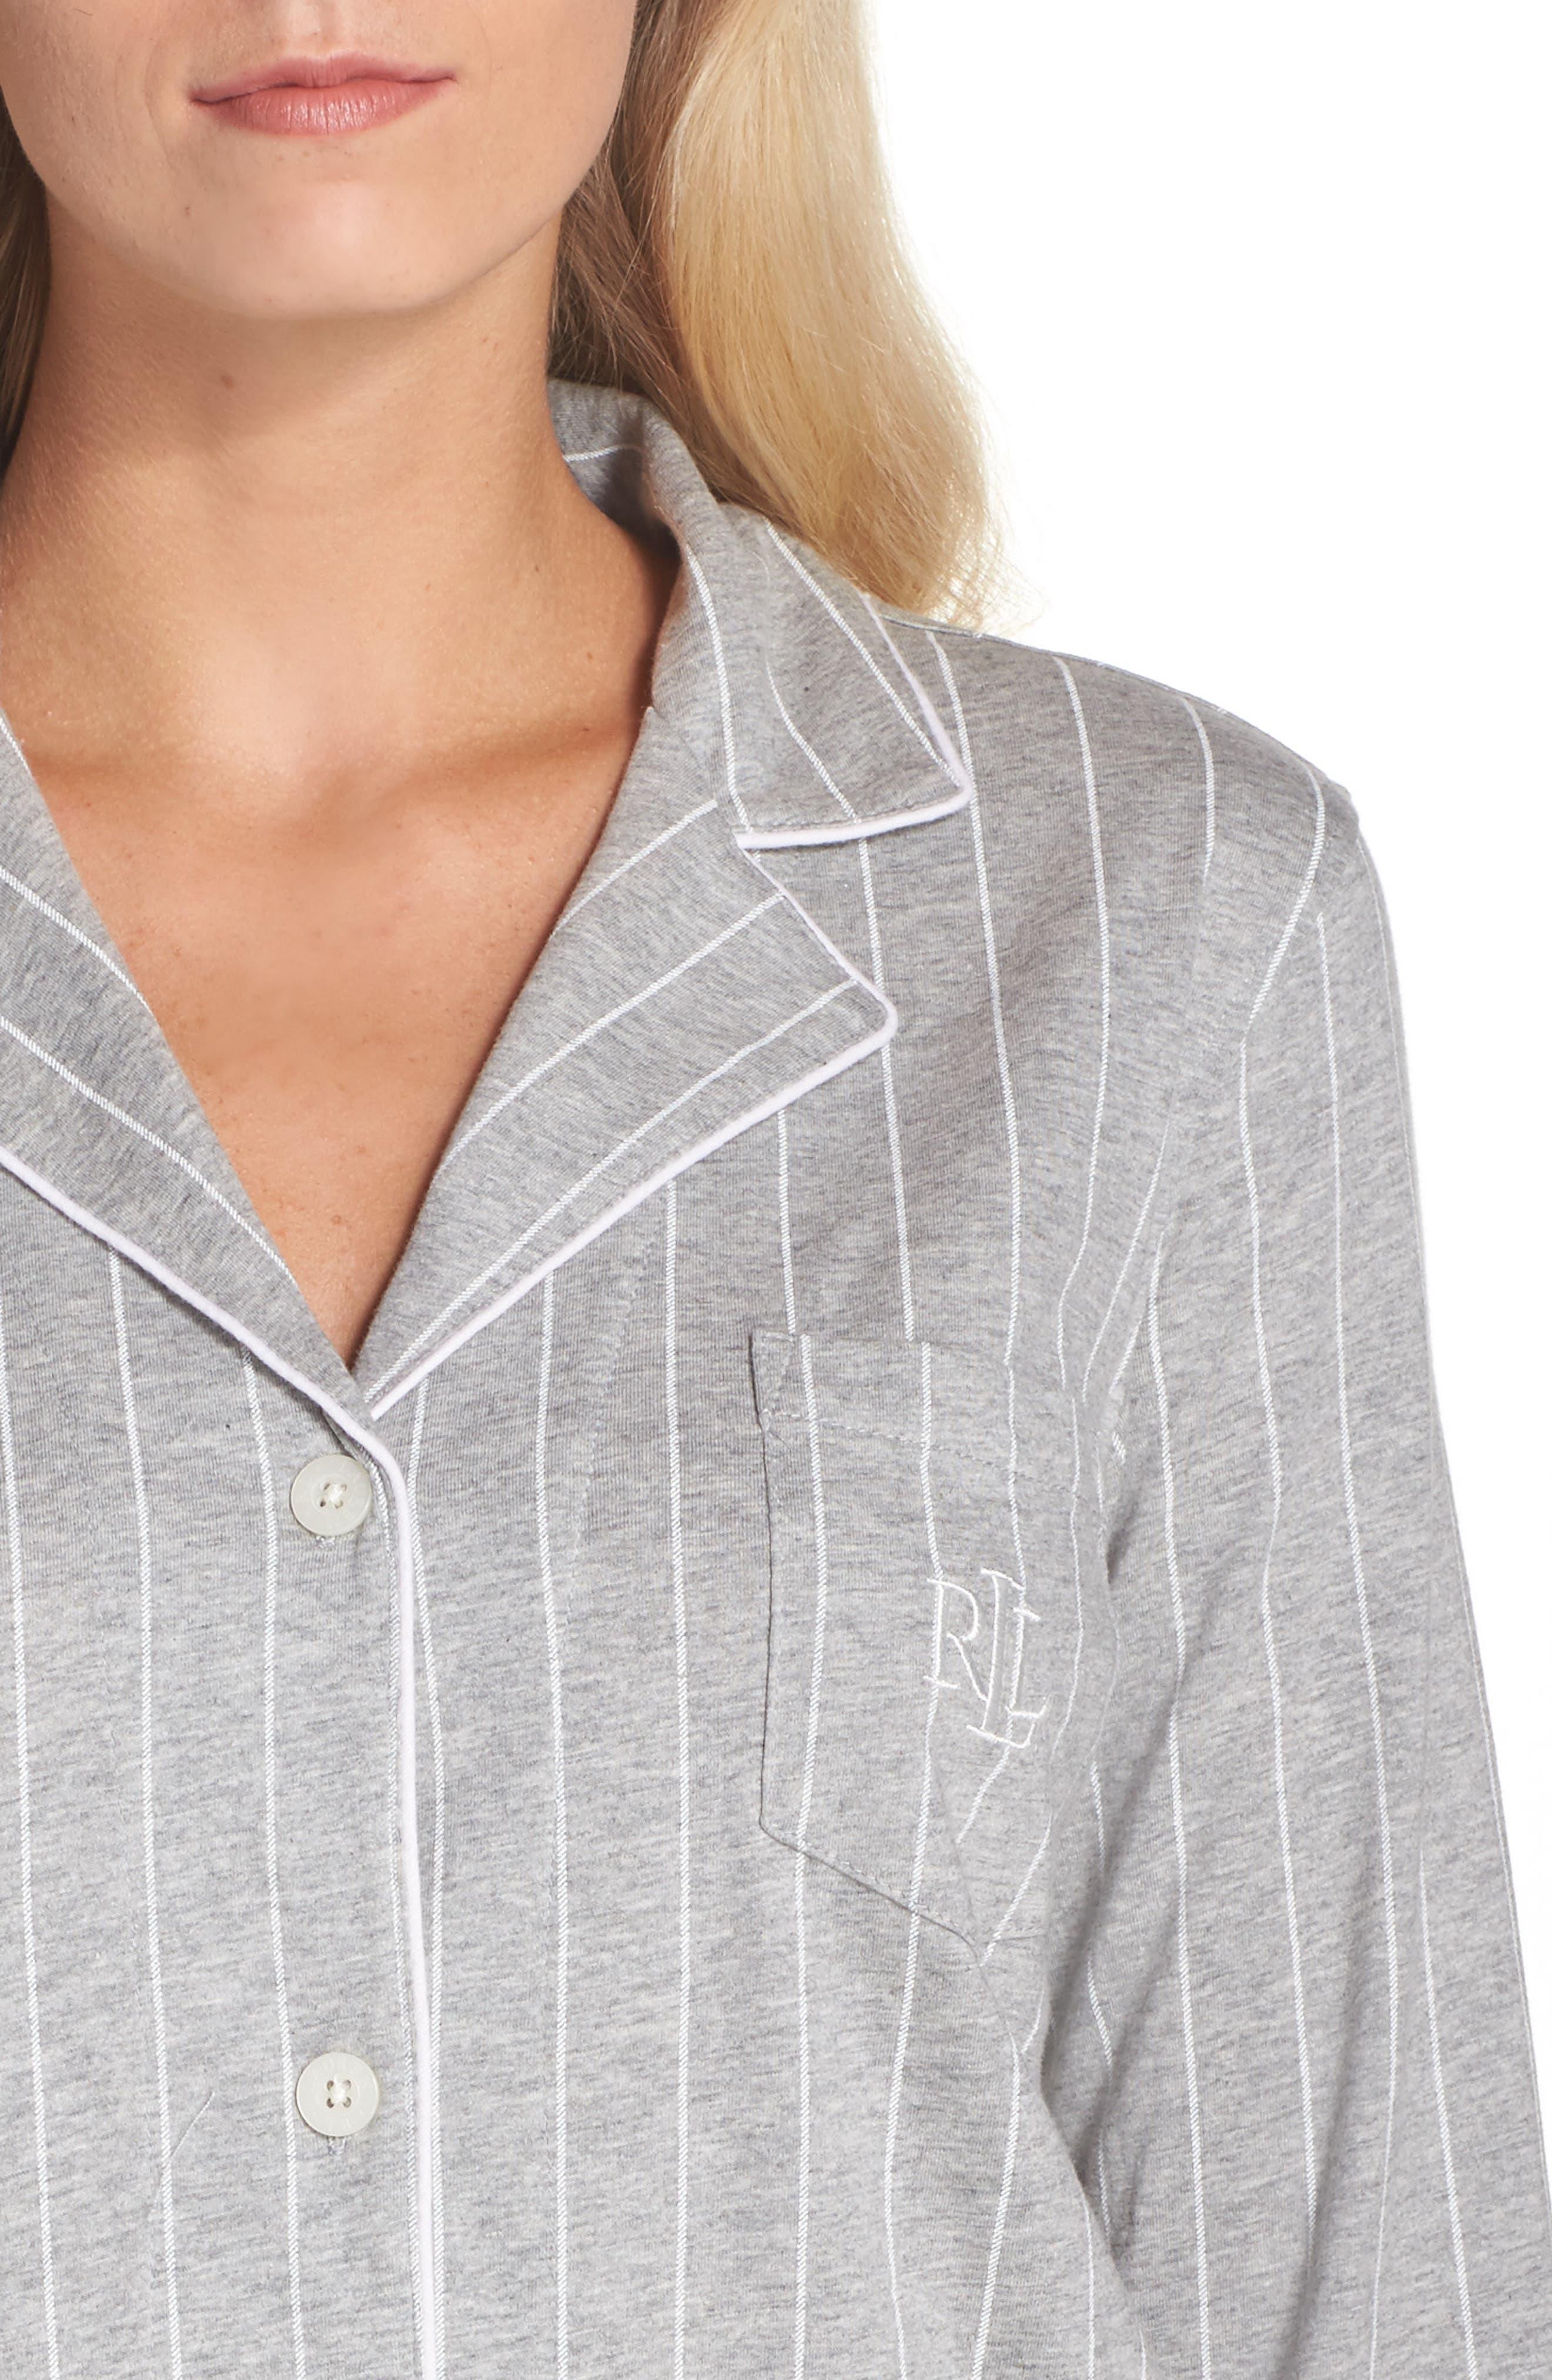 Notch Collar Pajamas,                             Alternate thumbnail 4, color,                             025